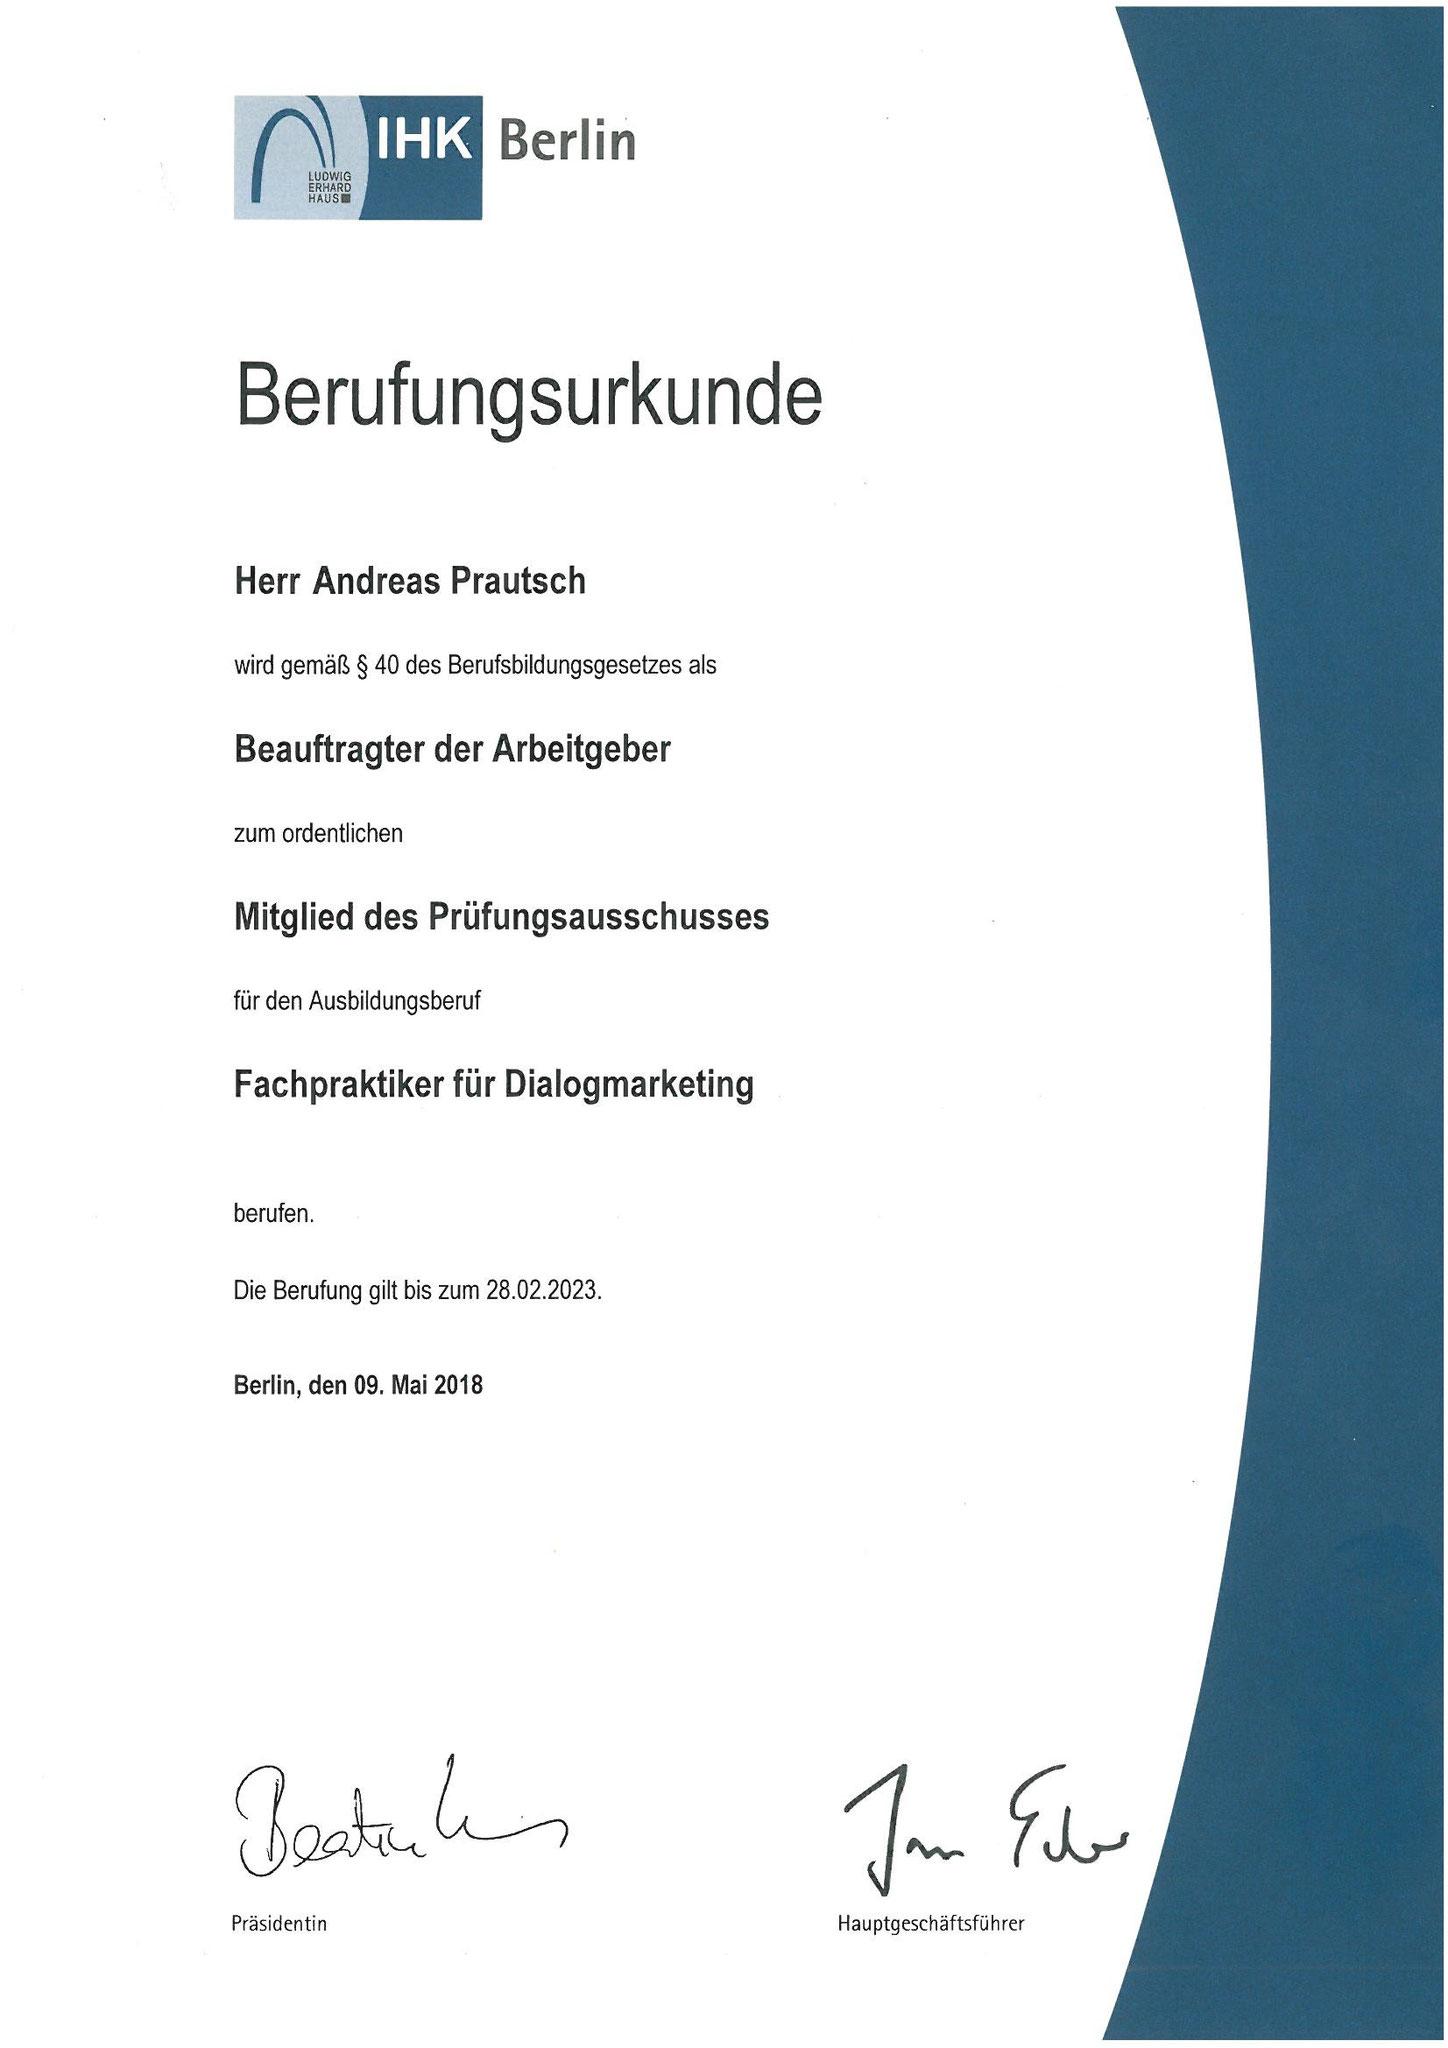 Prüfer im Prüfungsausschuss Dialogmarketing (Fachpraktiker) - 2018